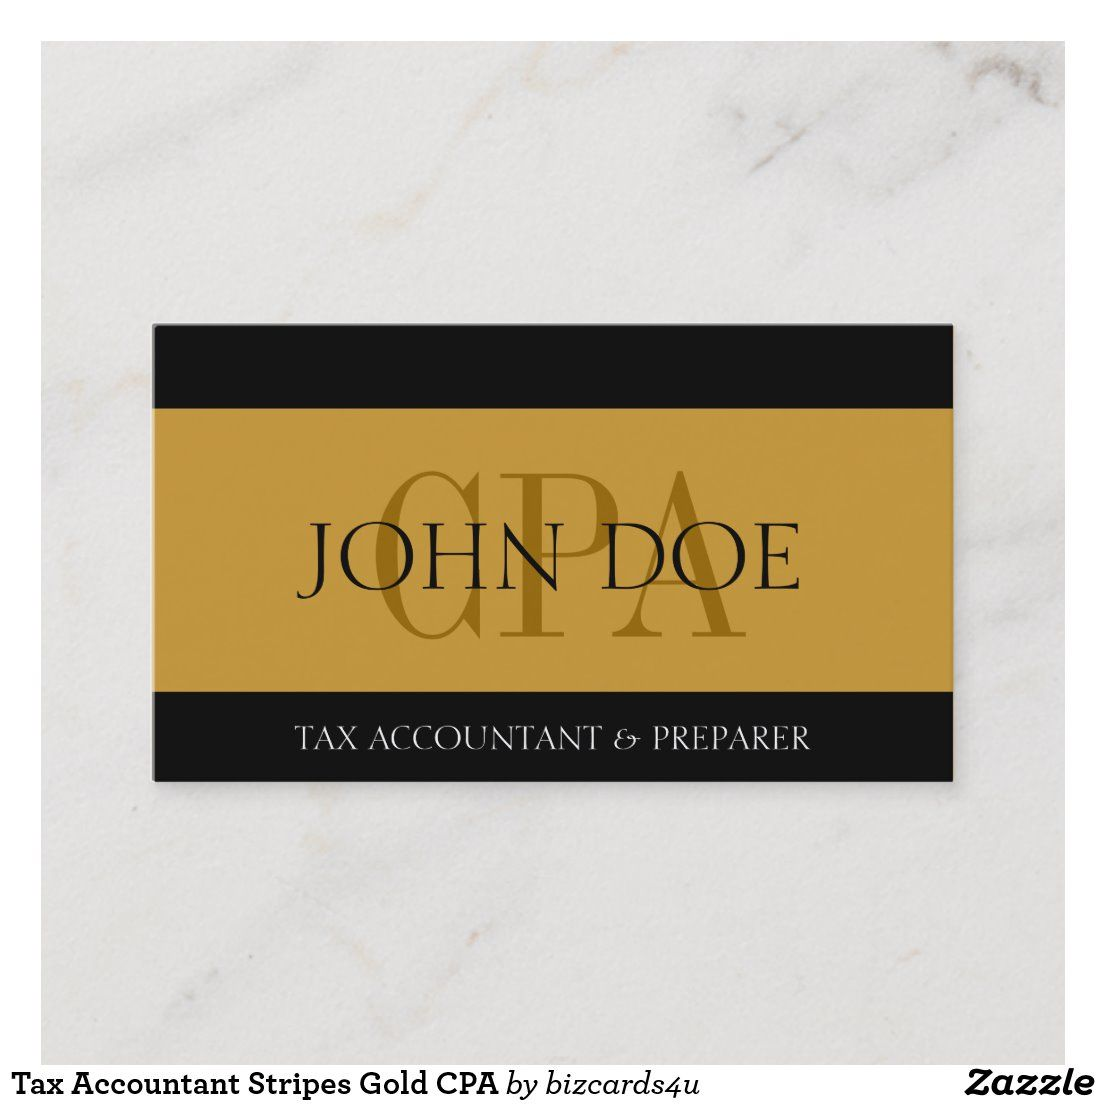 Tax Accountant Stripes Gold Cpa Business Card Zazzle Com Gold Business Card Tax Accountant Tax Preparation